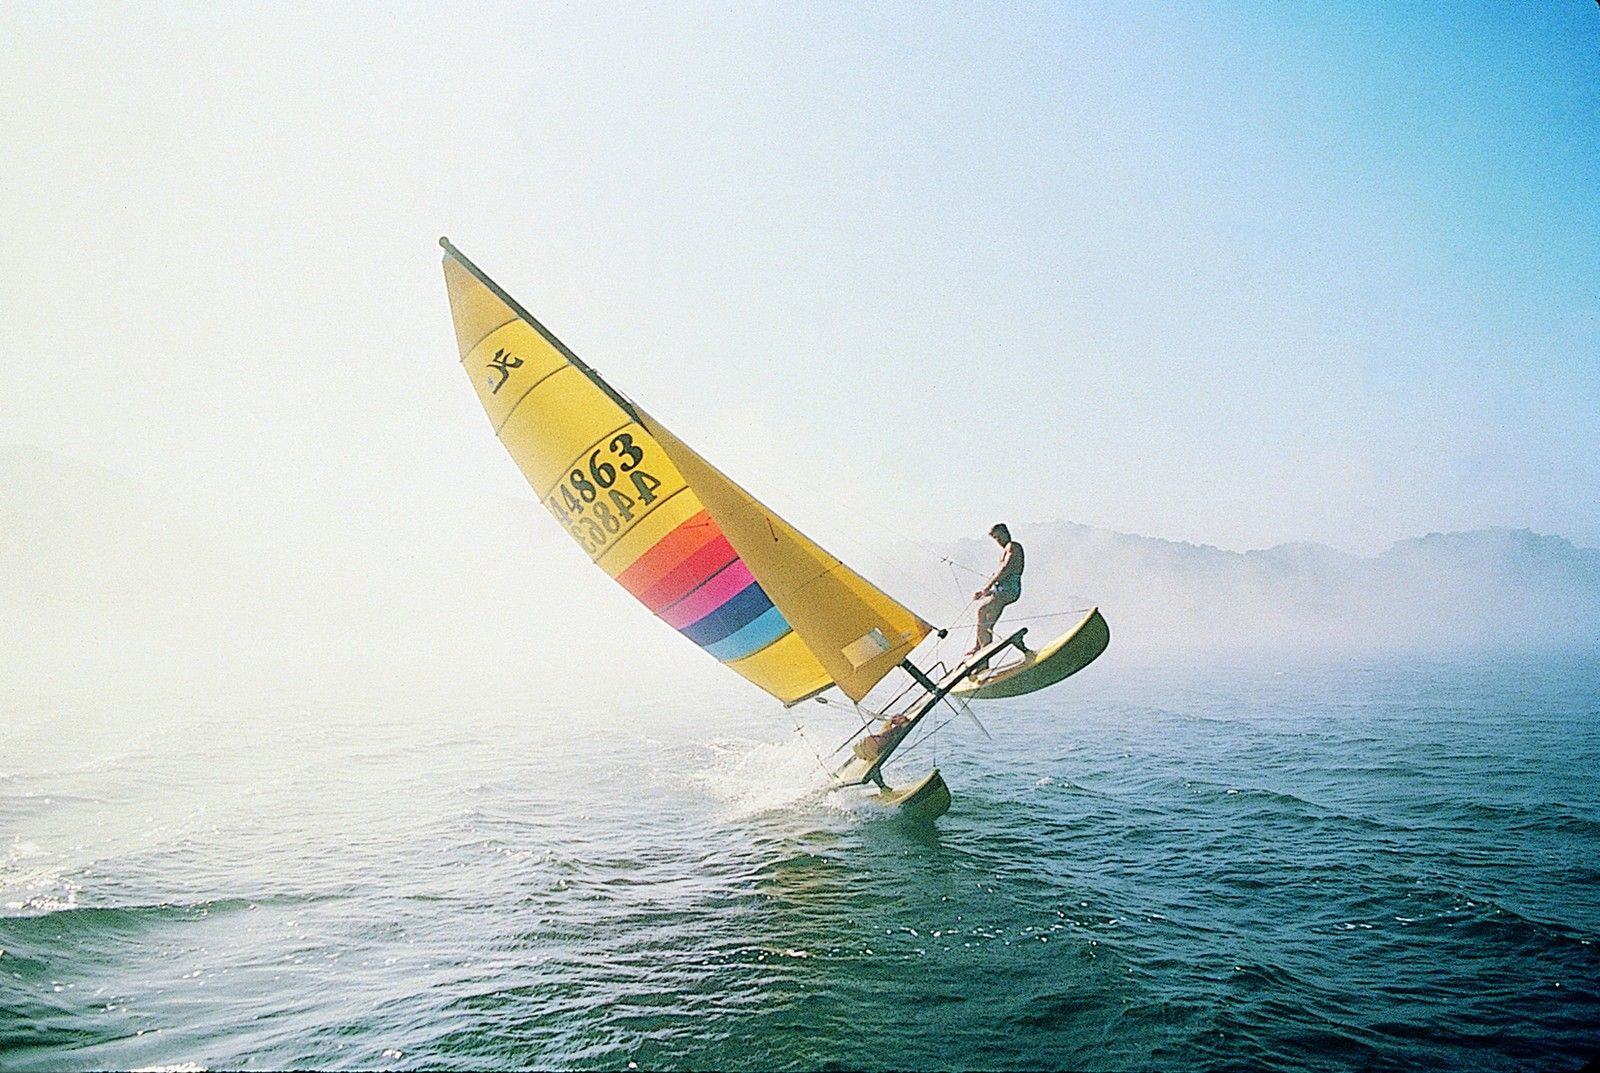 Hobie 14 (Photo Credit Pierrick Contin) Sailing